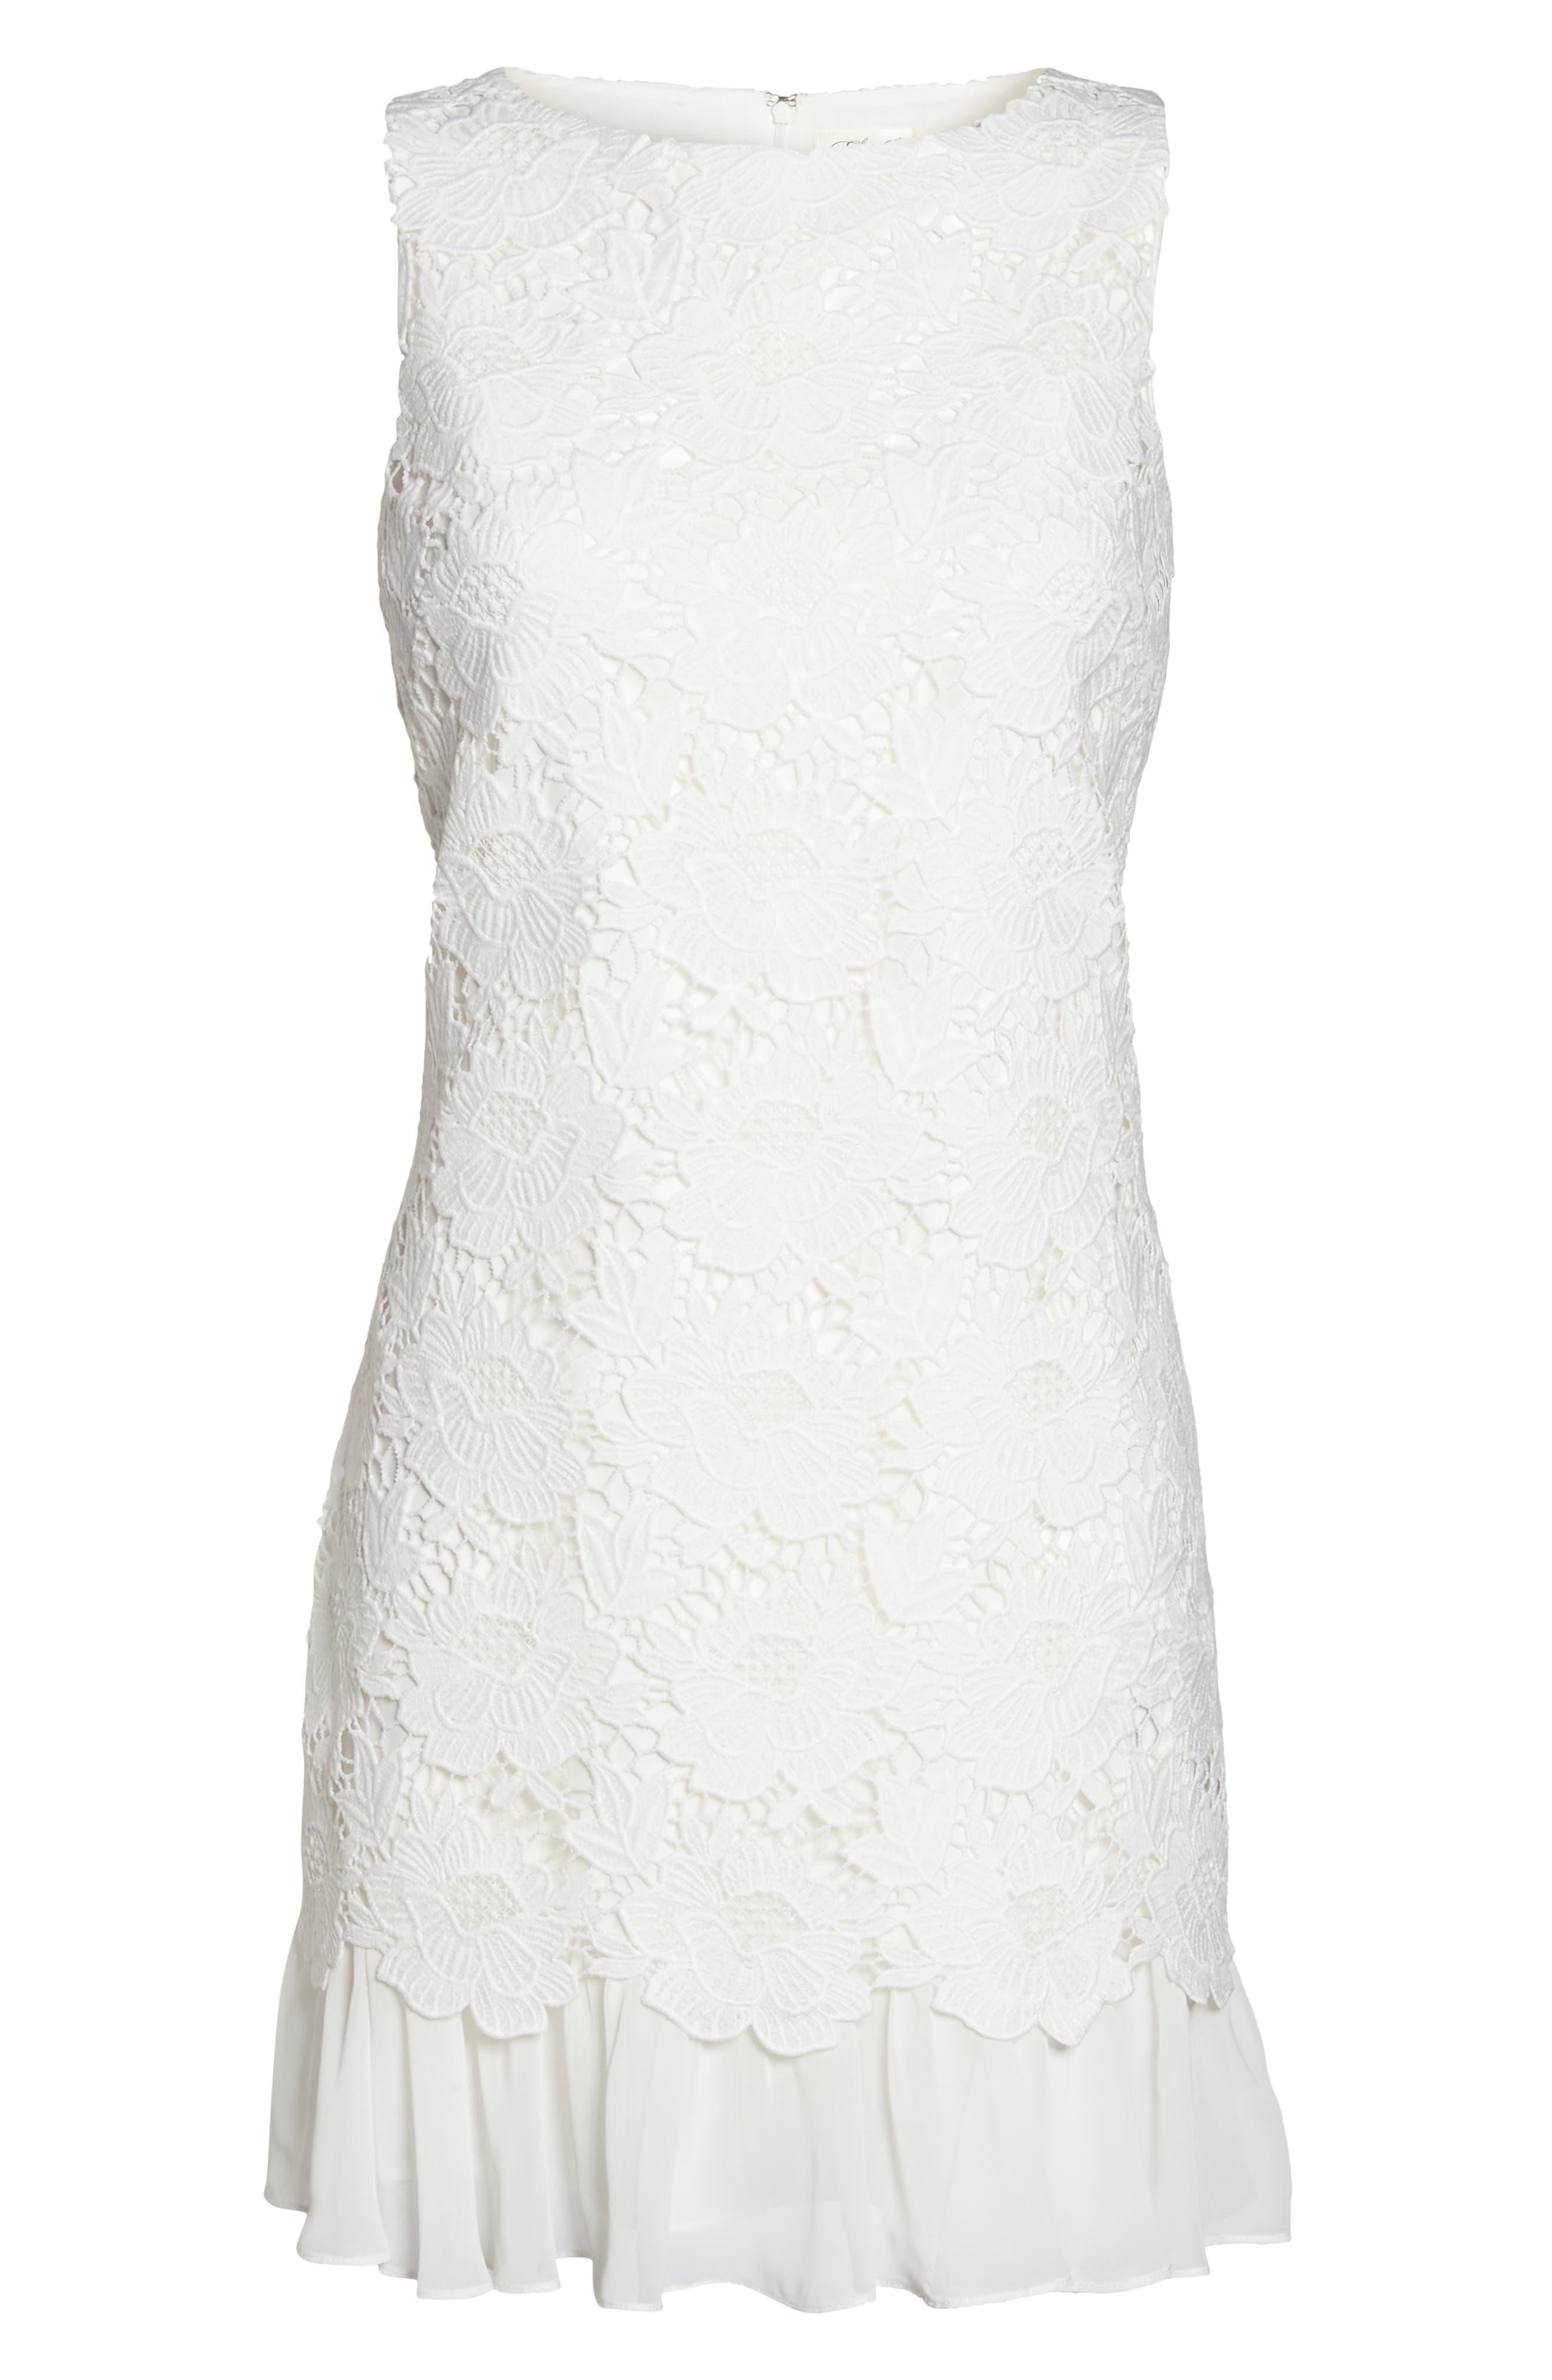 Lace Ruffle Hem Sheath Dress,                             Alternate thumbnail 12, color,